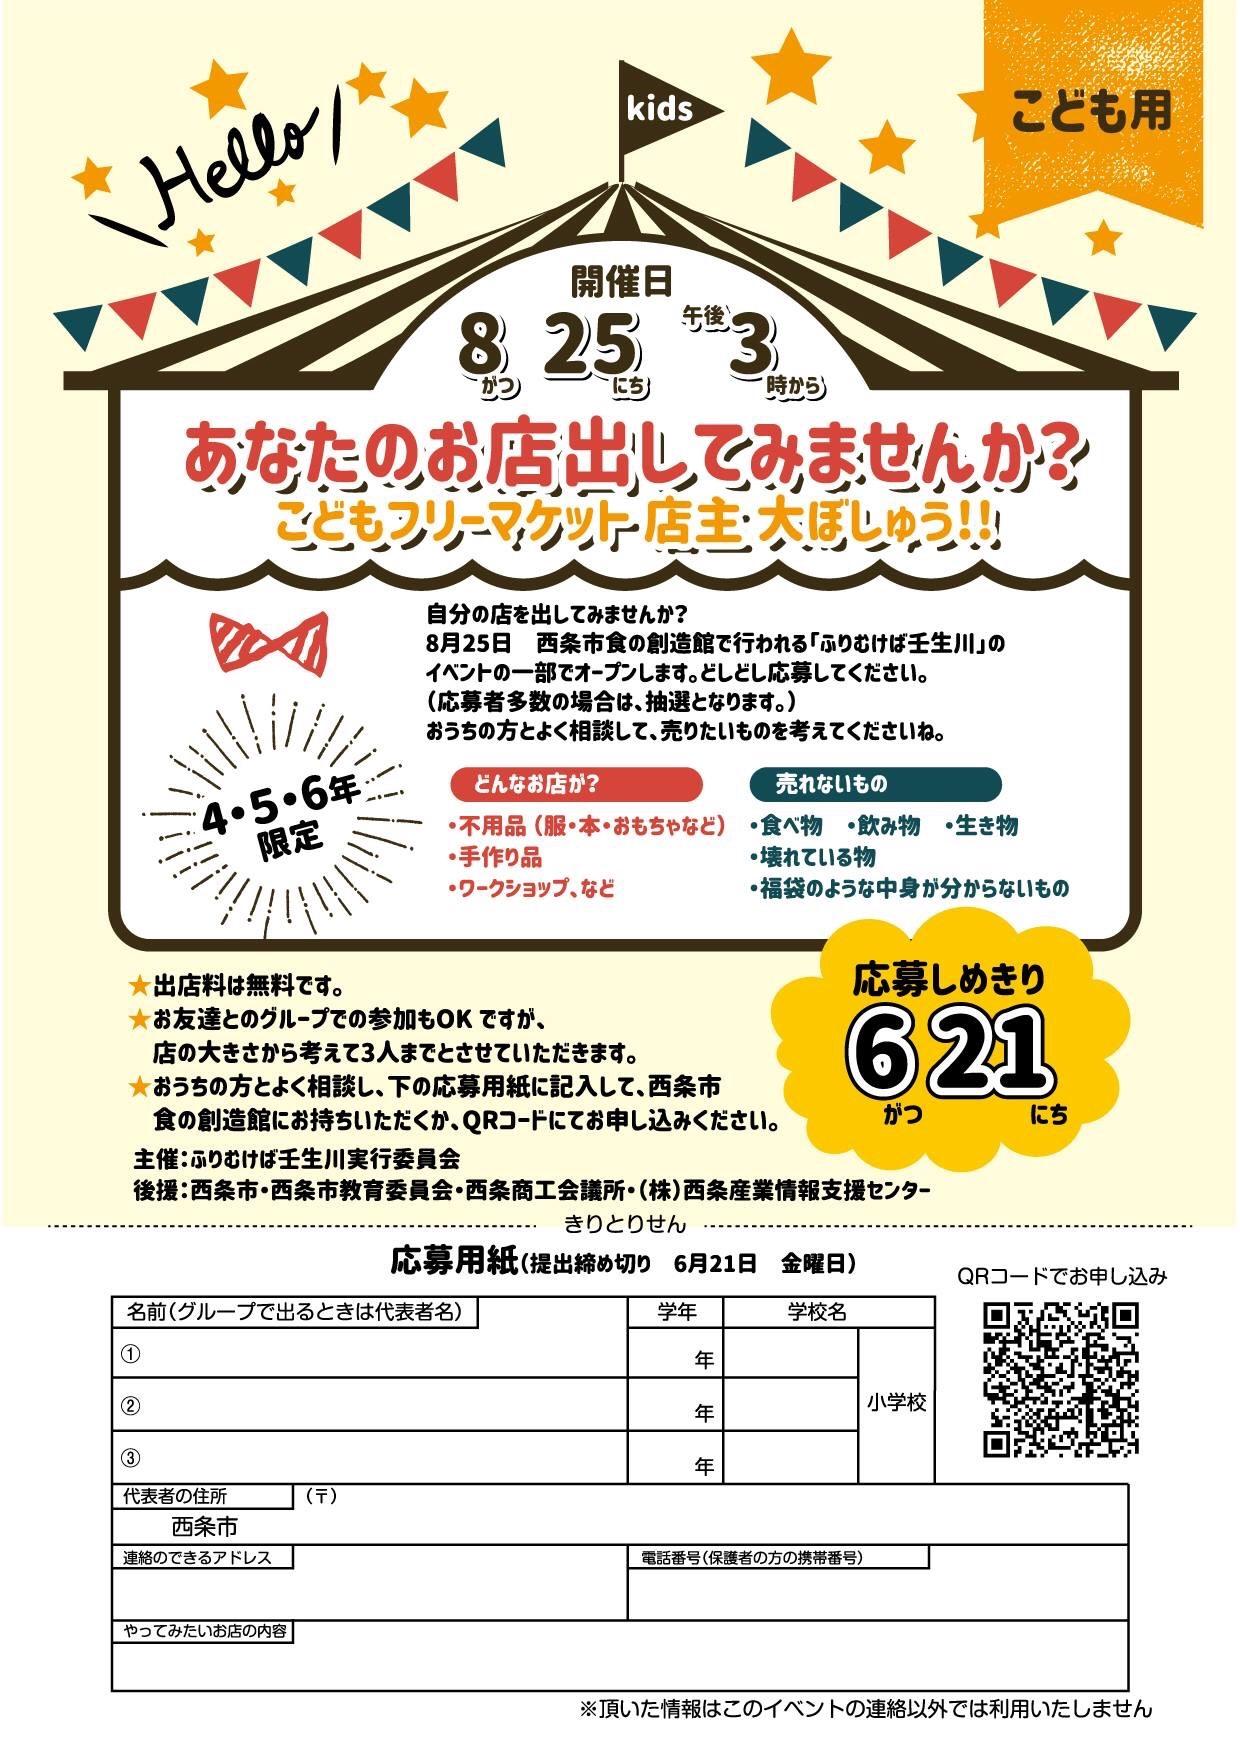 f:id:masanori-kato1972:20190618202715j:image